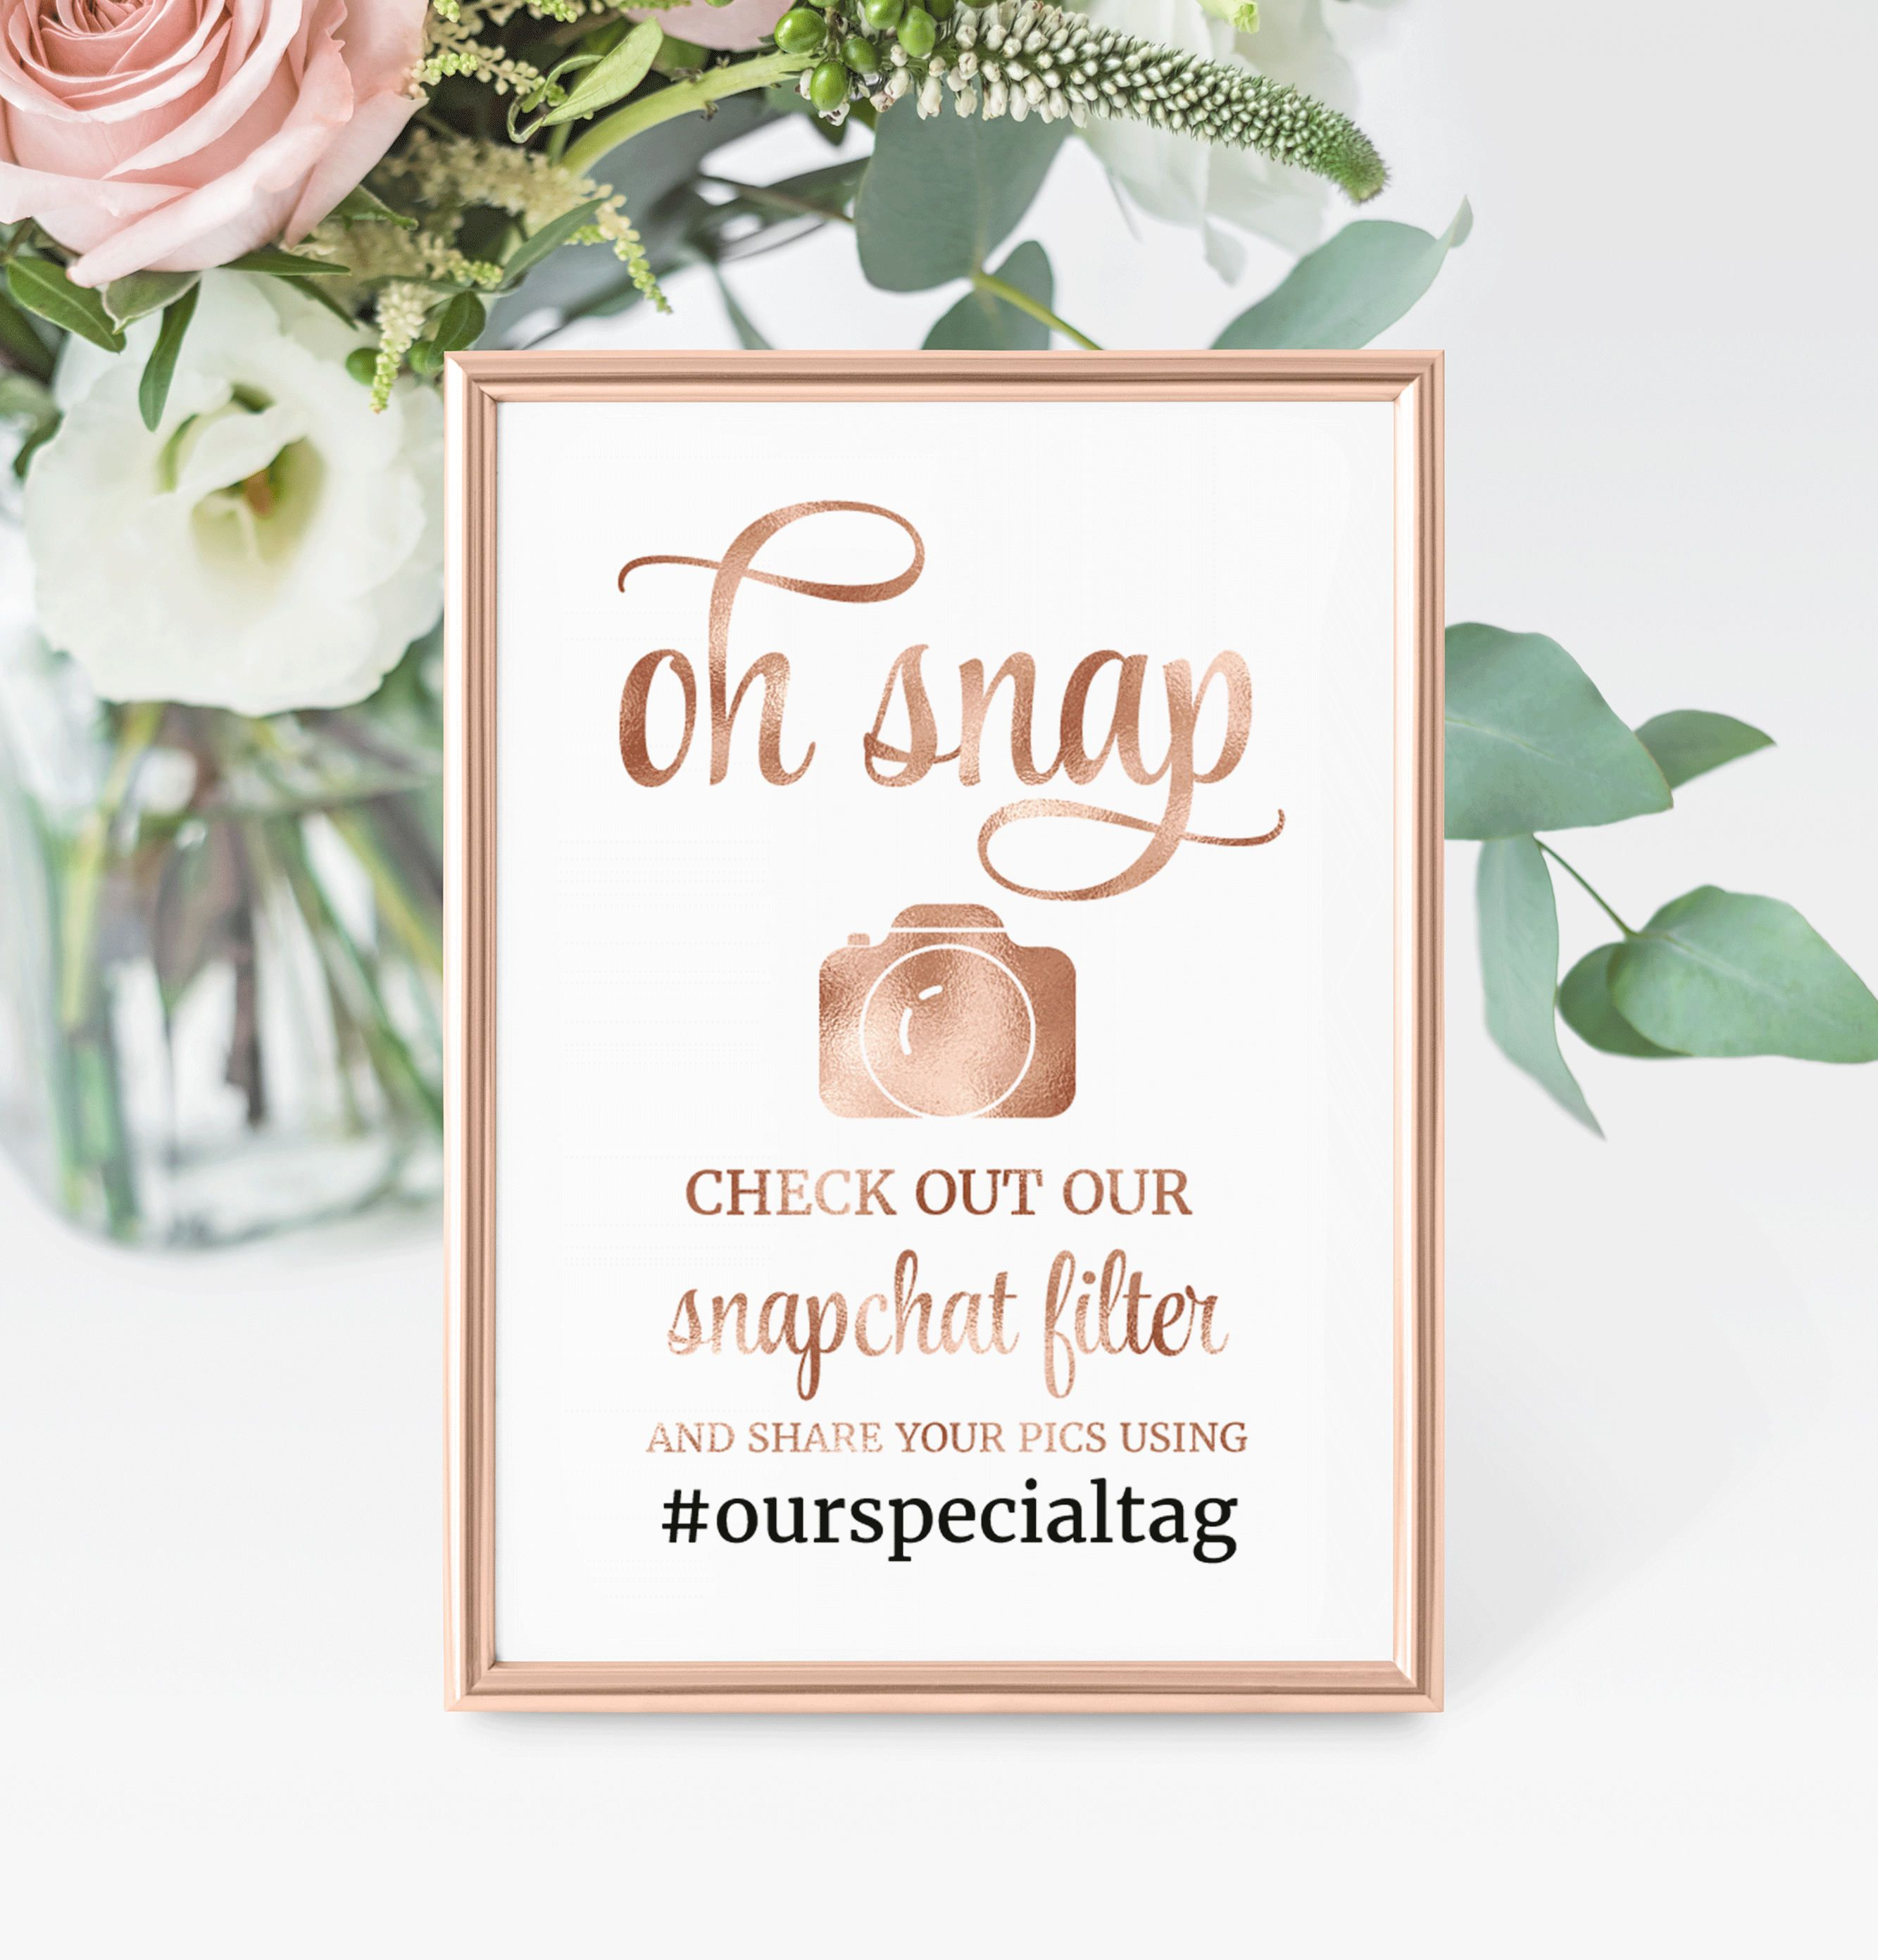 Wedding Snapchat filter sign, Rose Gold Hashtag Sign